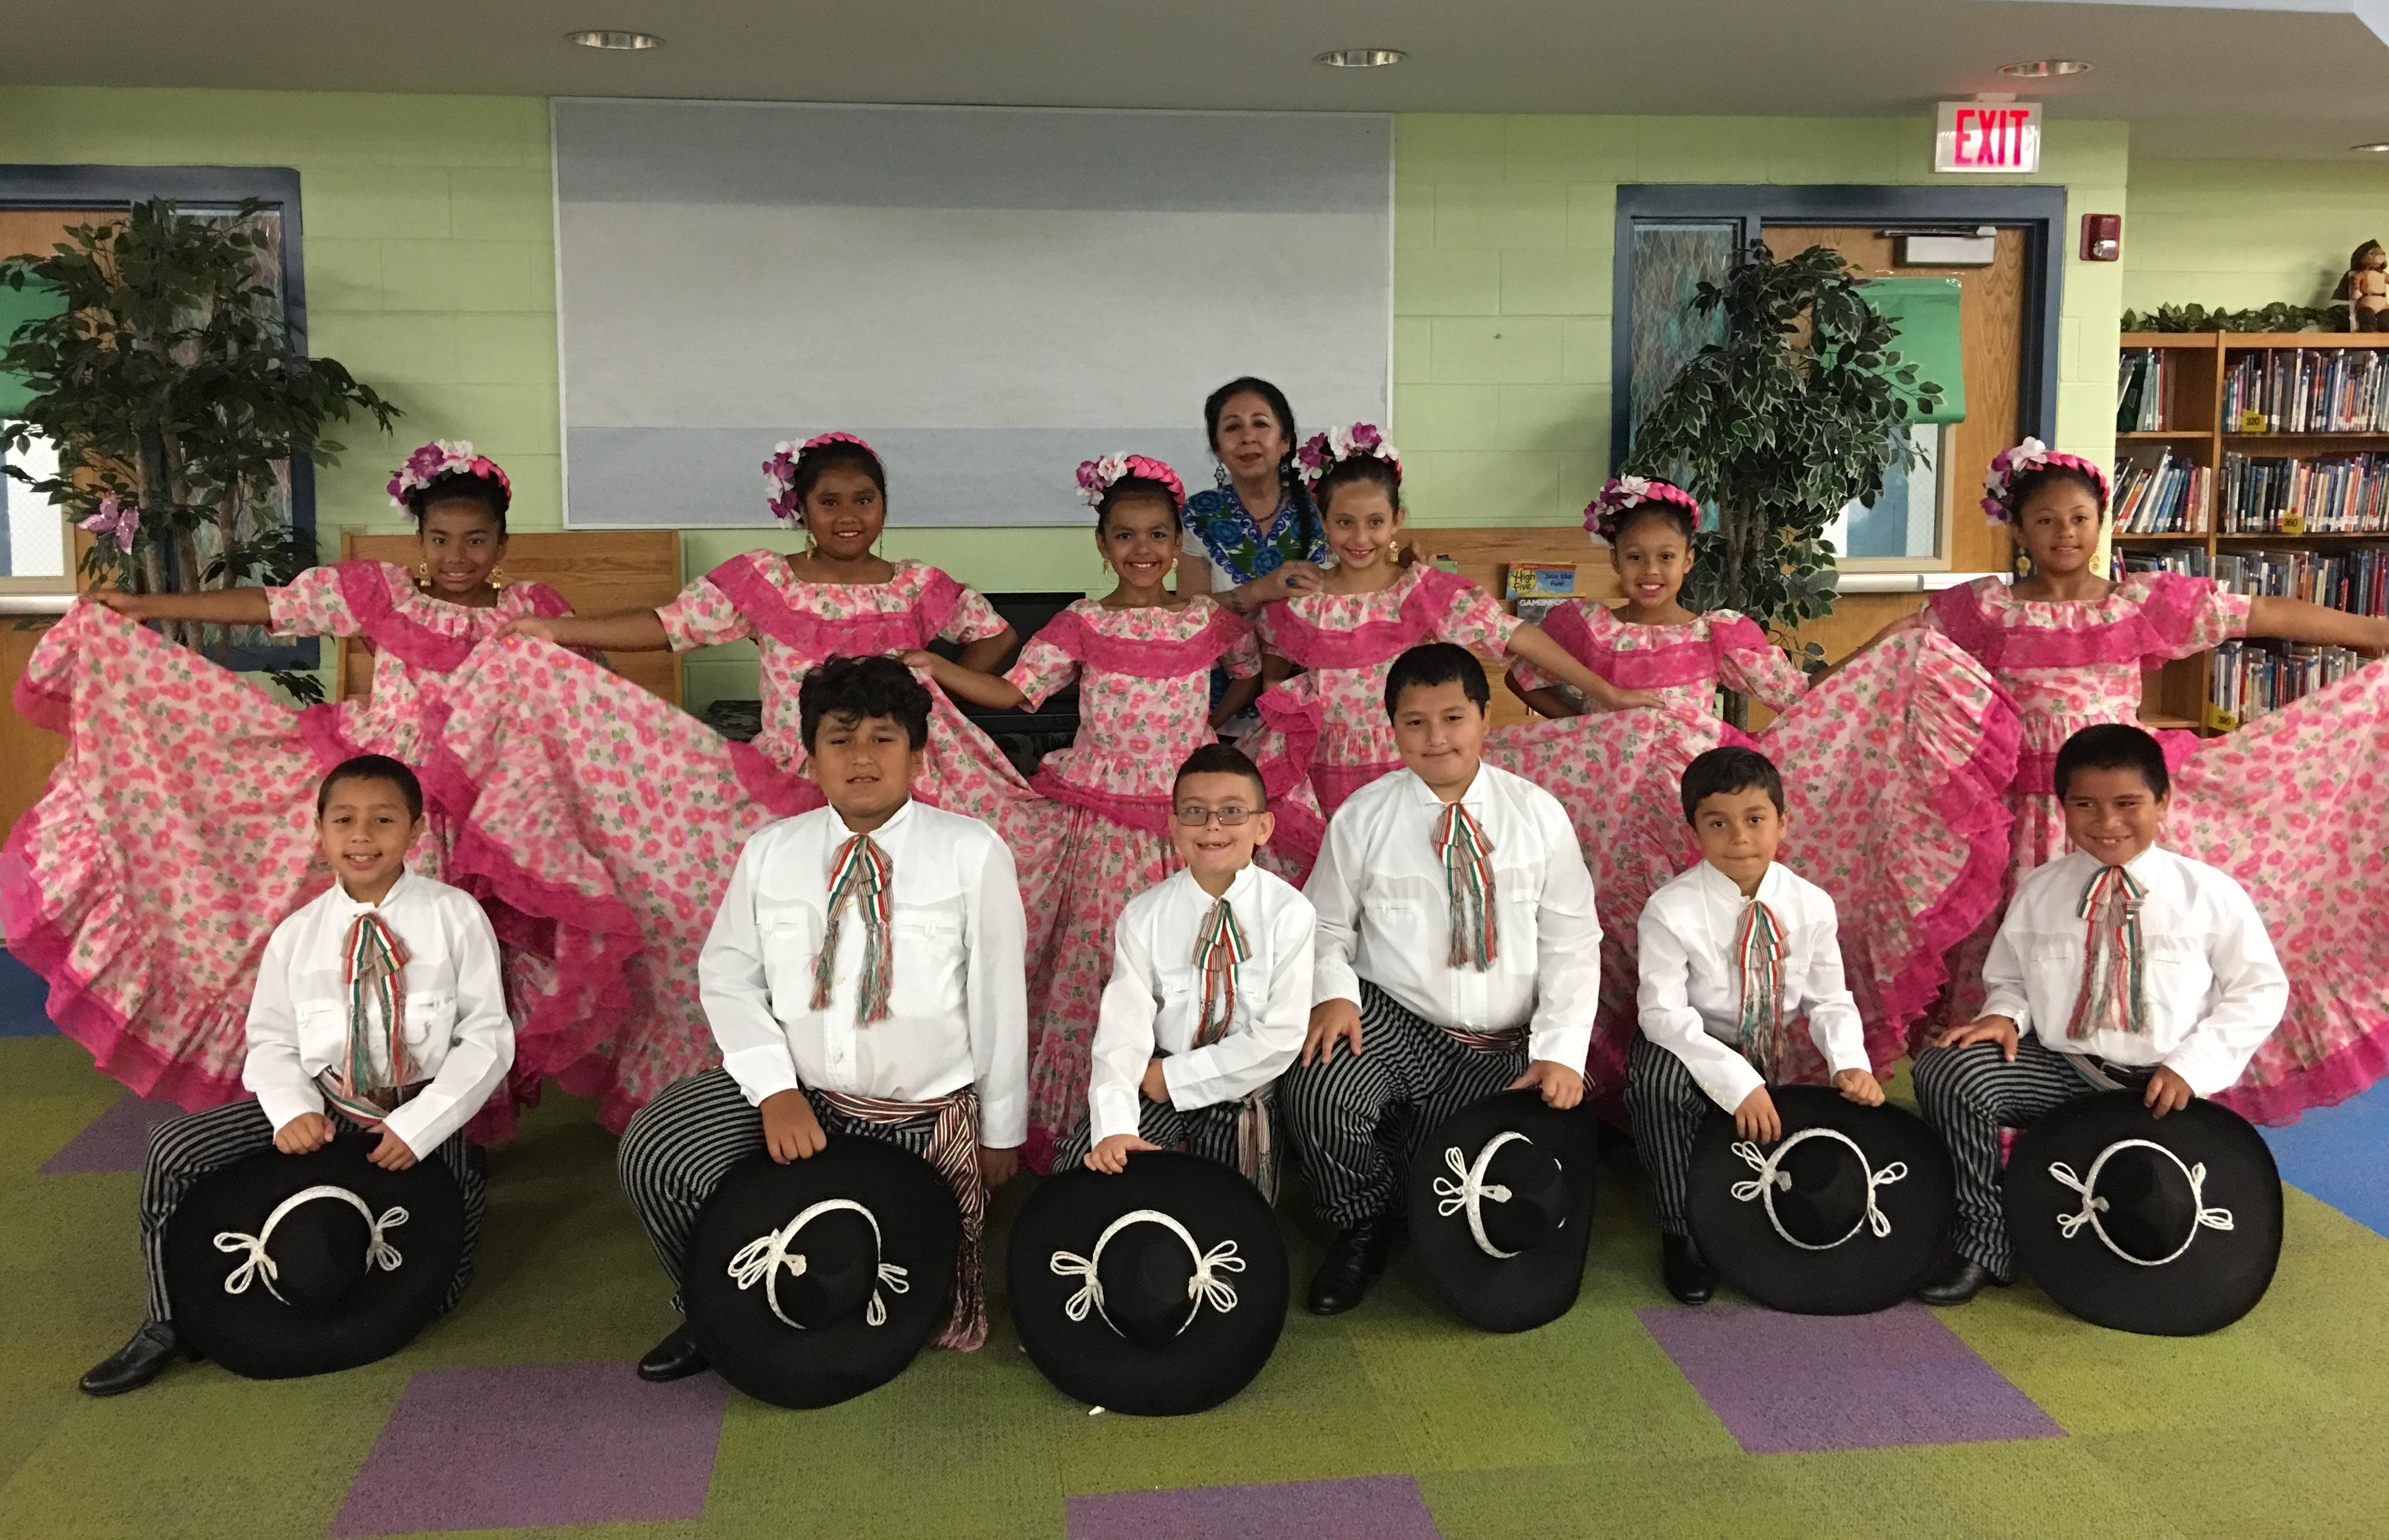 Casey Elementary Ballet Folklorico Fundraiser